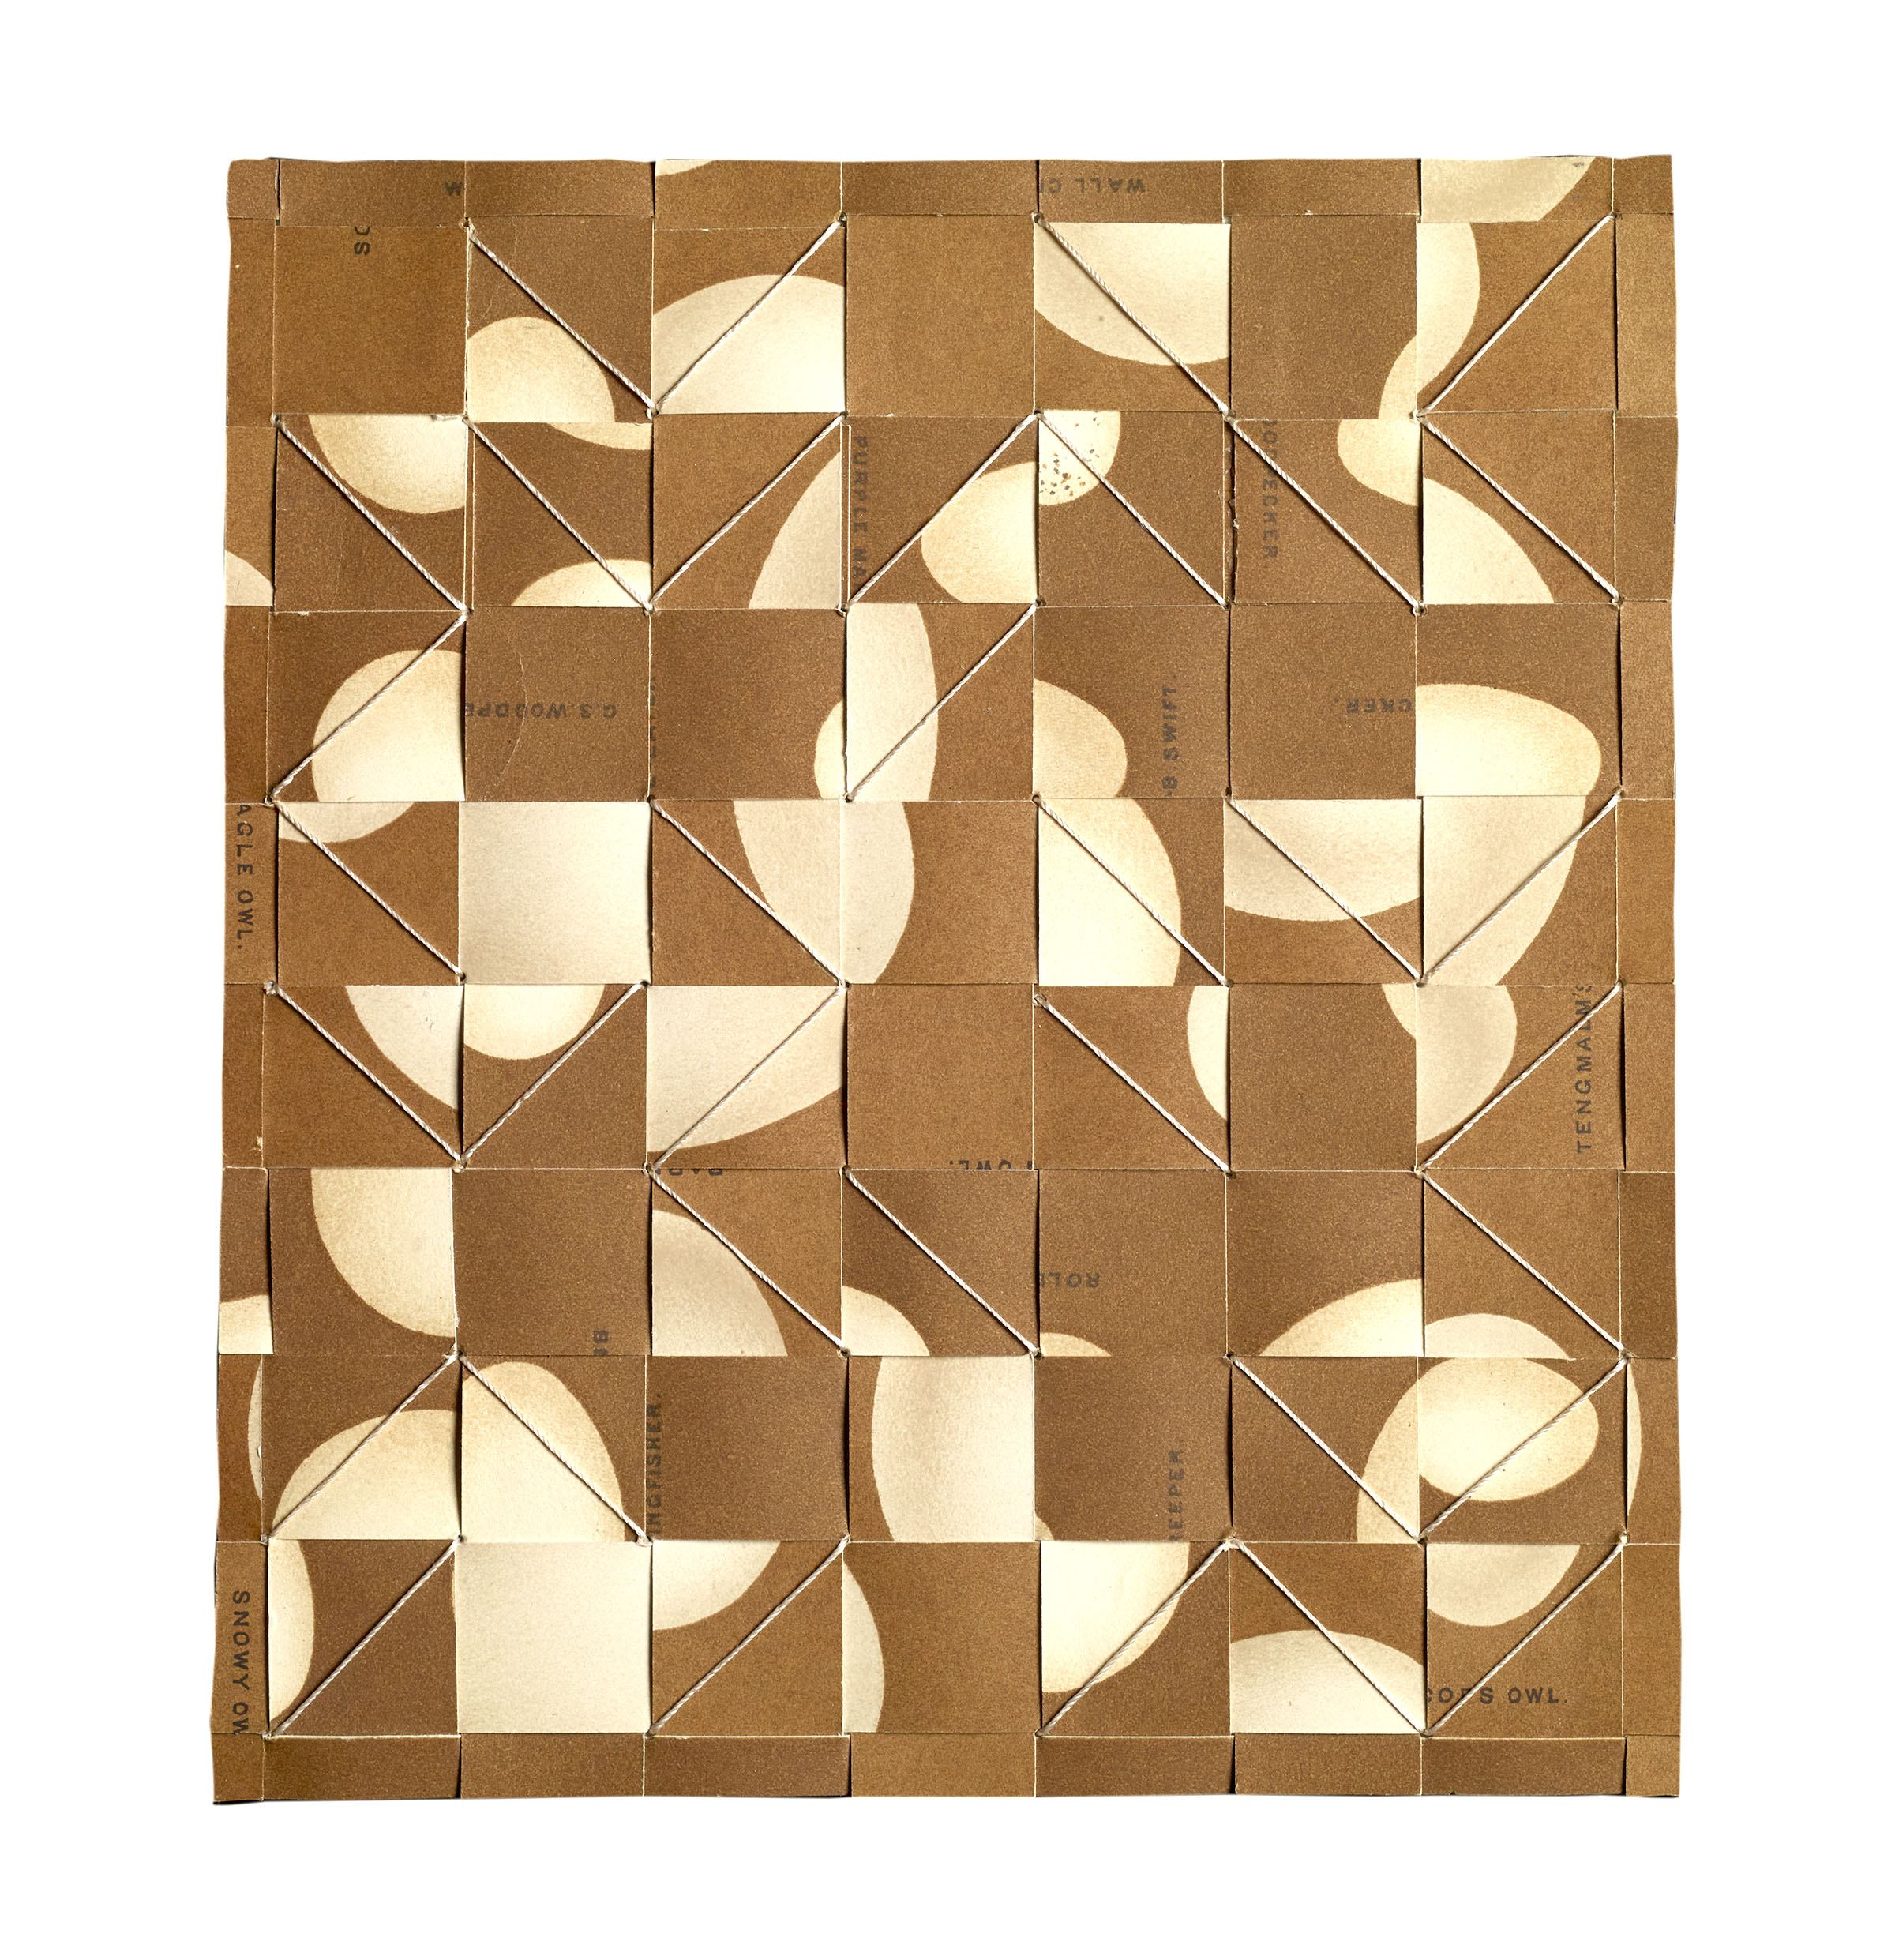 Kunstadt_OVUM XIV-Breakthrough, silk thread, paper- 1880's Gronvold Colour  Bookplates, 6.75 x 6.5 in